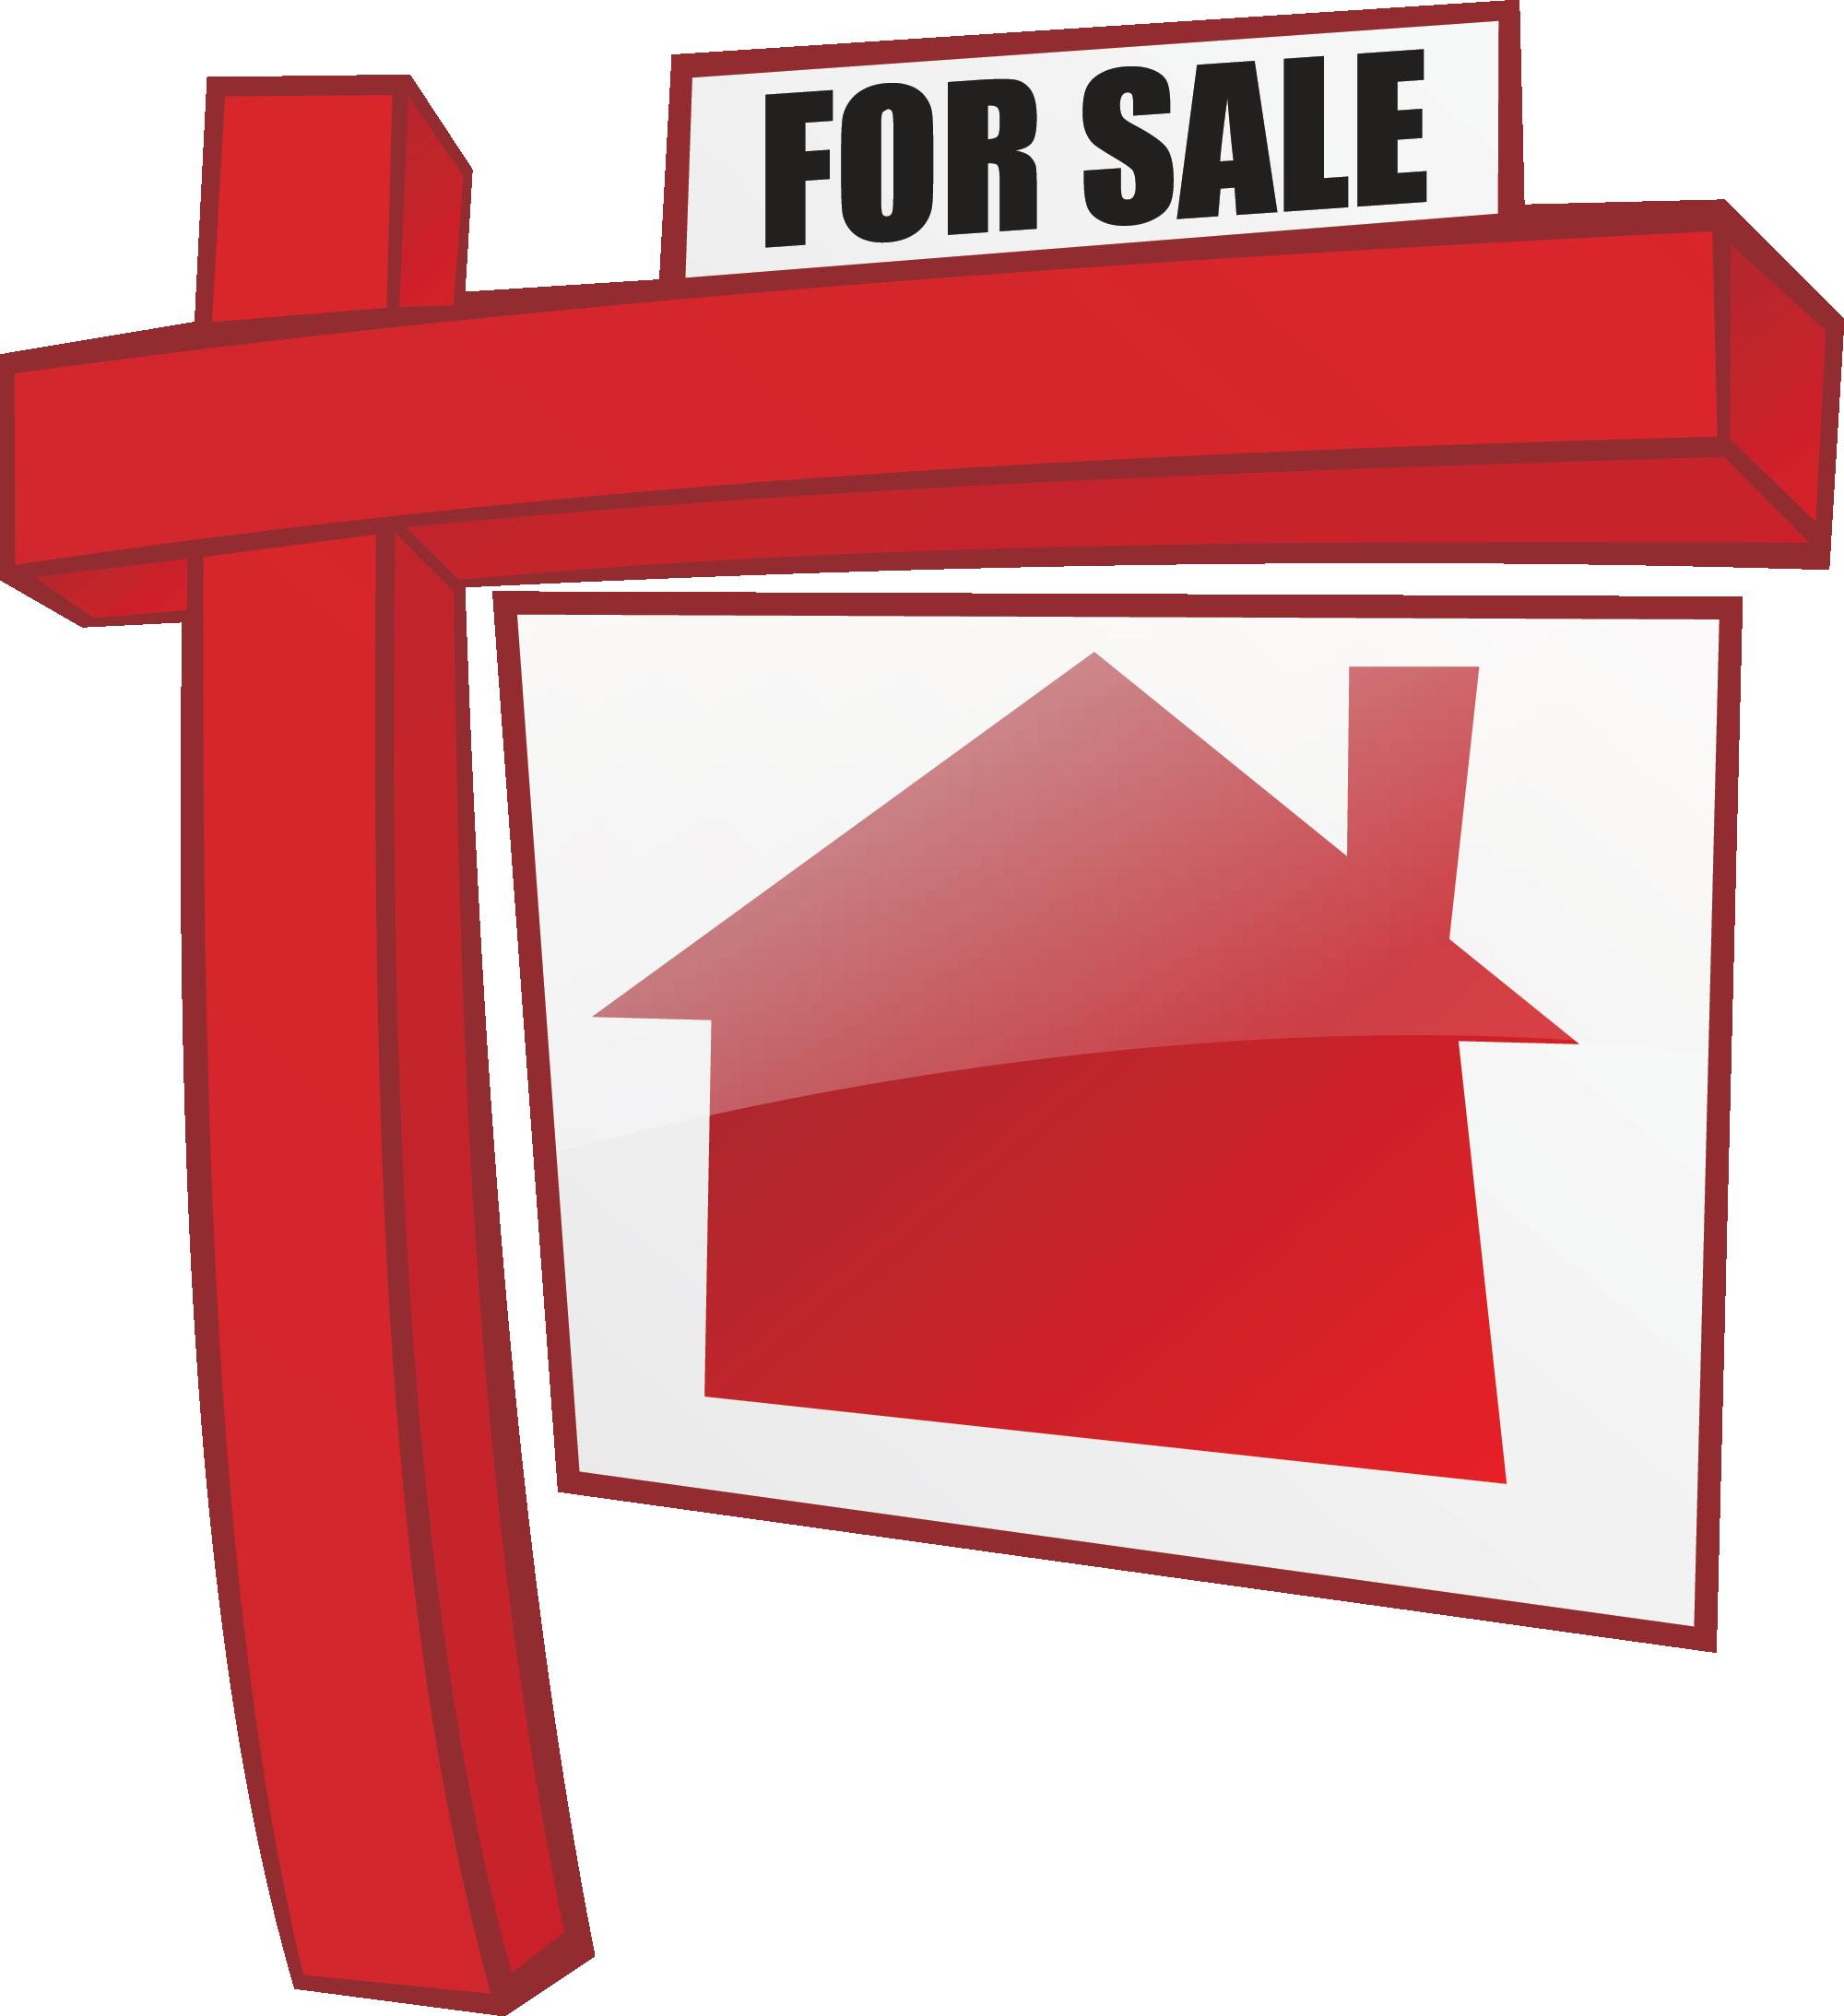 House for sale incep. Neighborhood clipart public housing